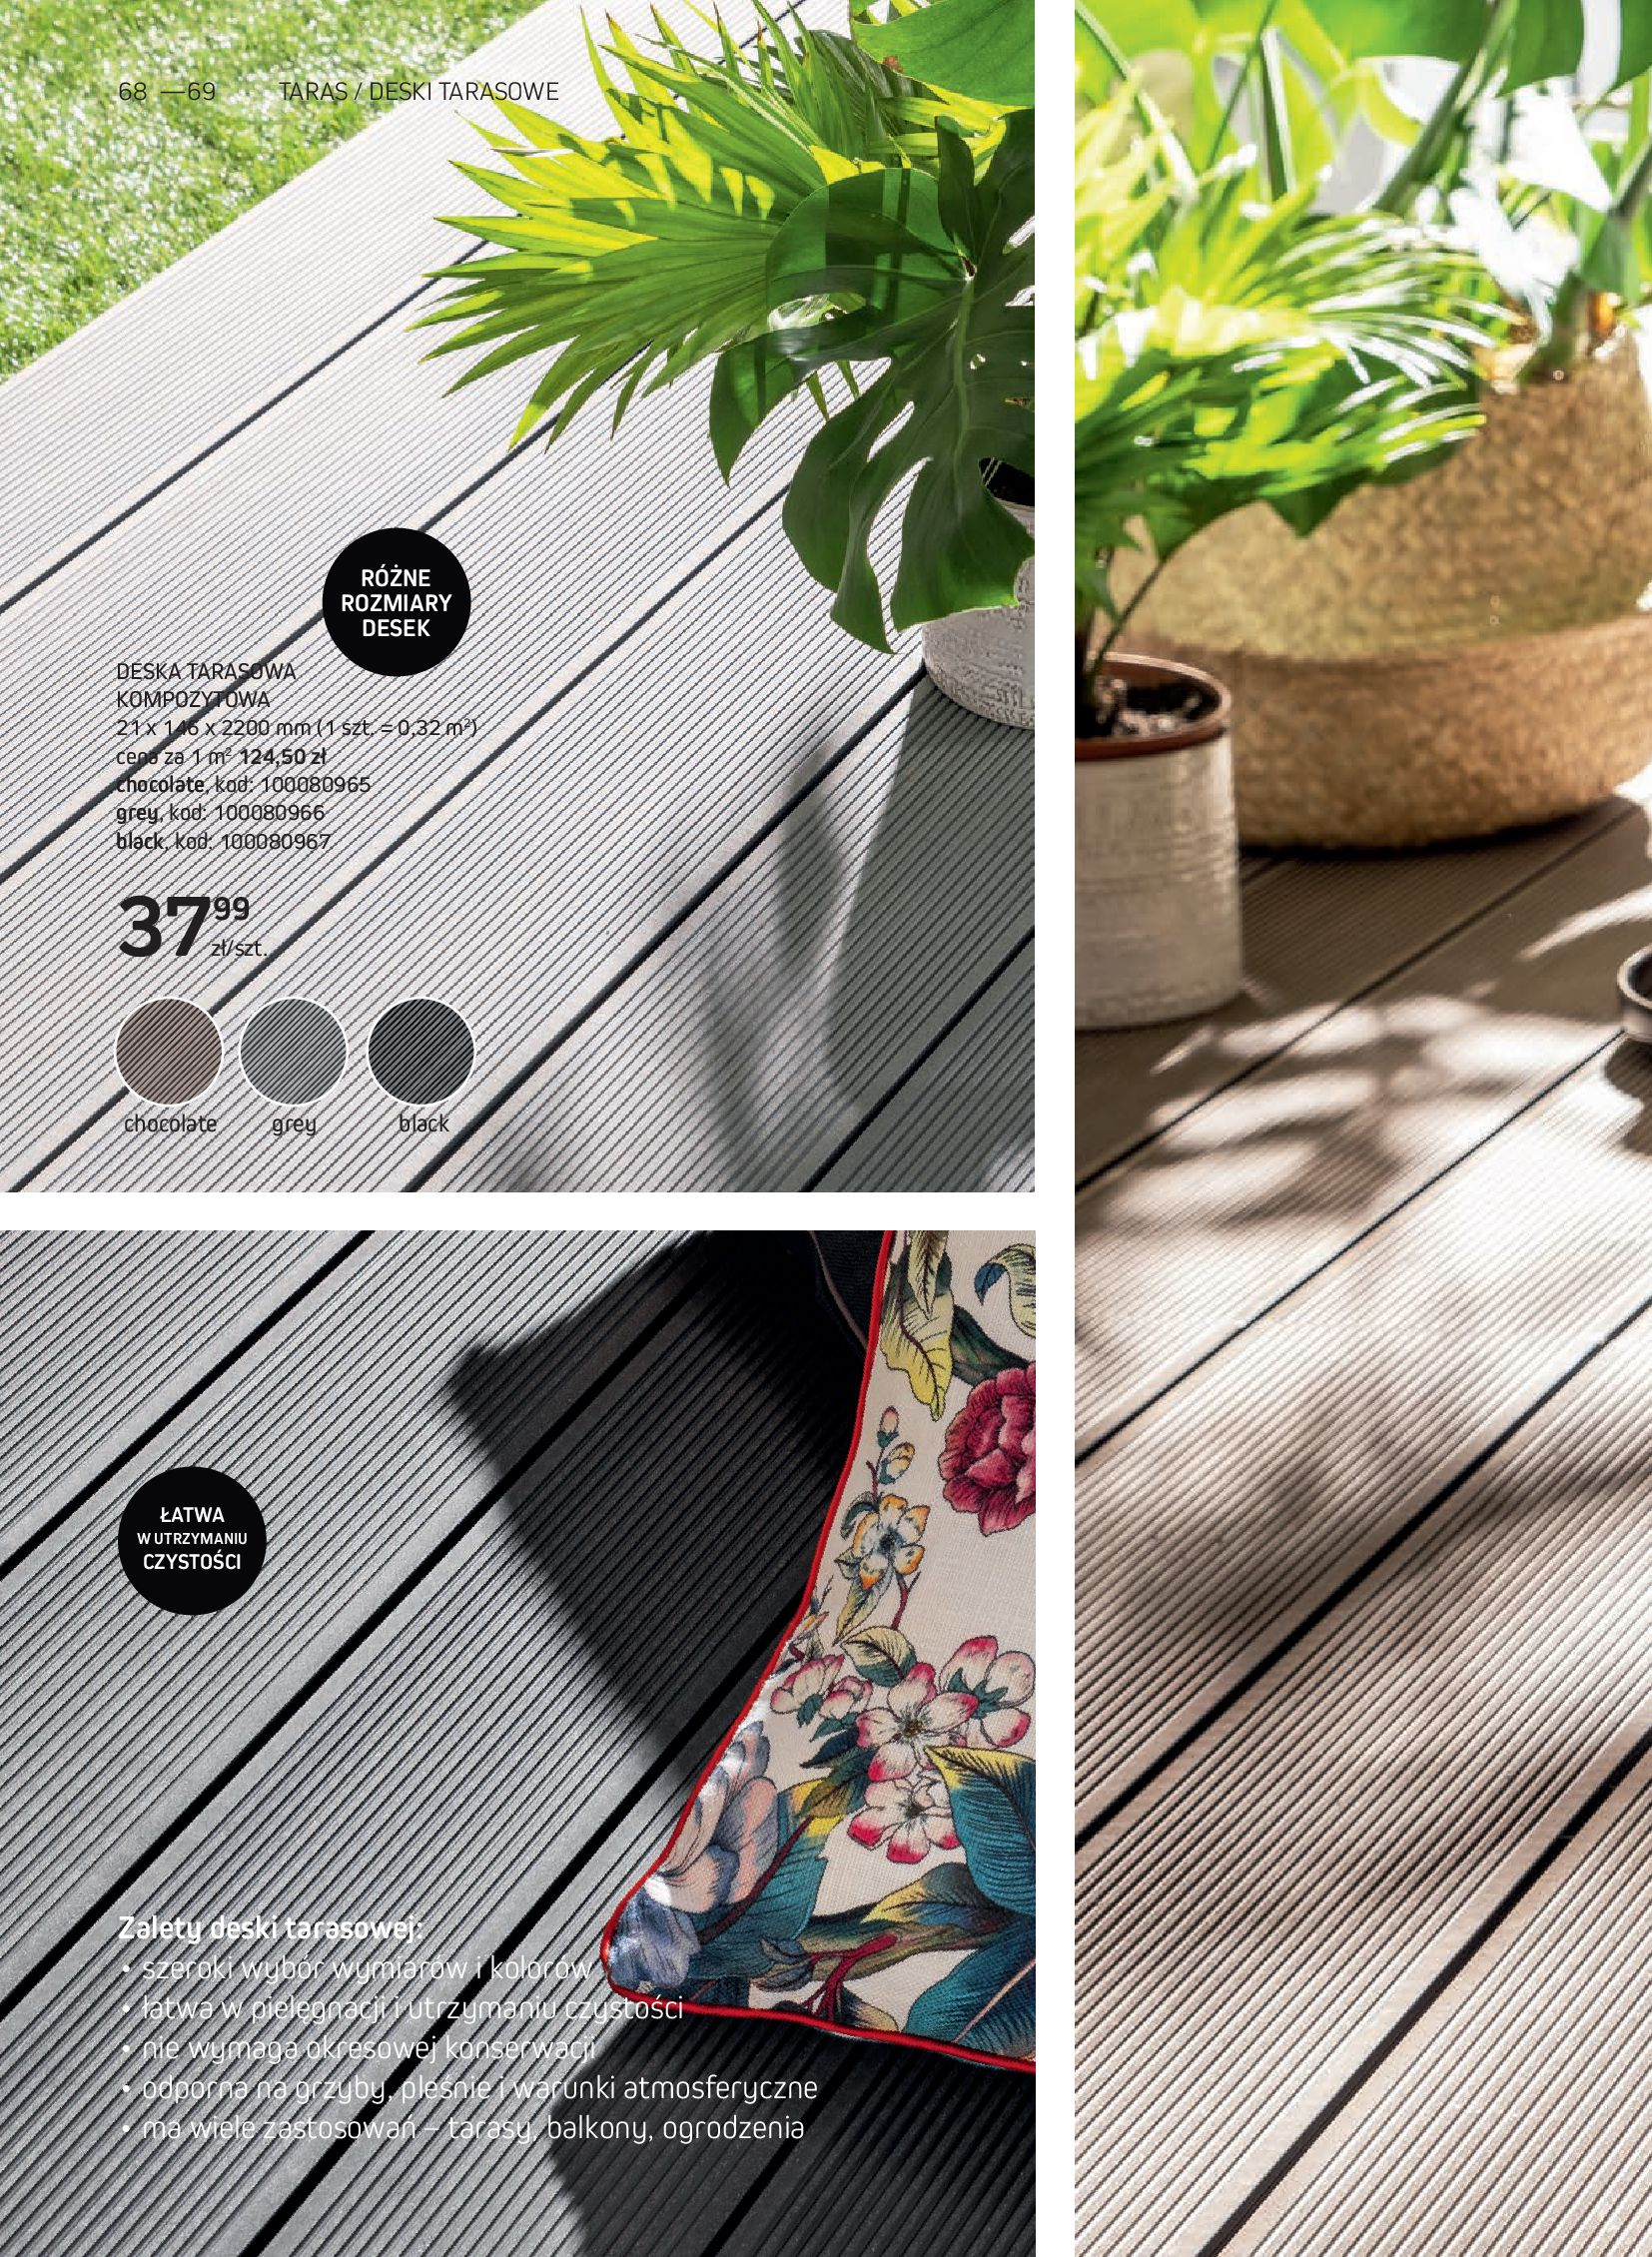 Gazetka Komfort: Gazetka Komfort - Katalog podłogi i drzwi 2021-06-16 page-68